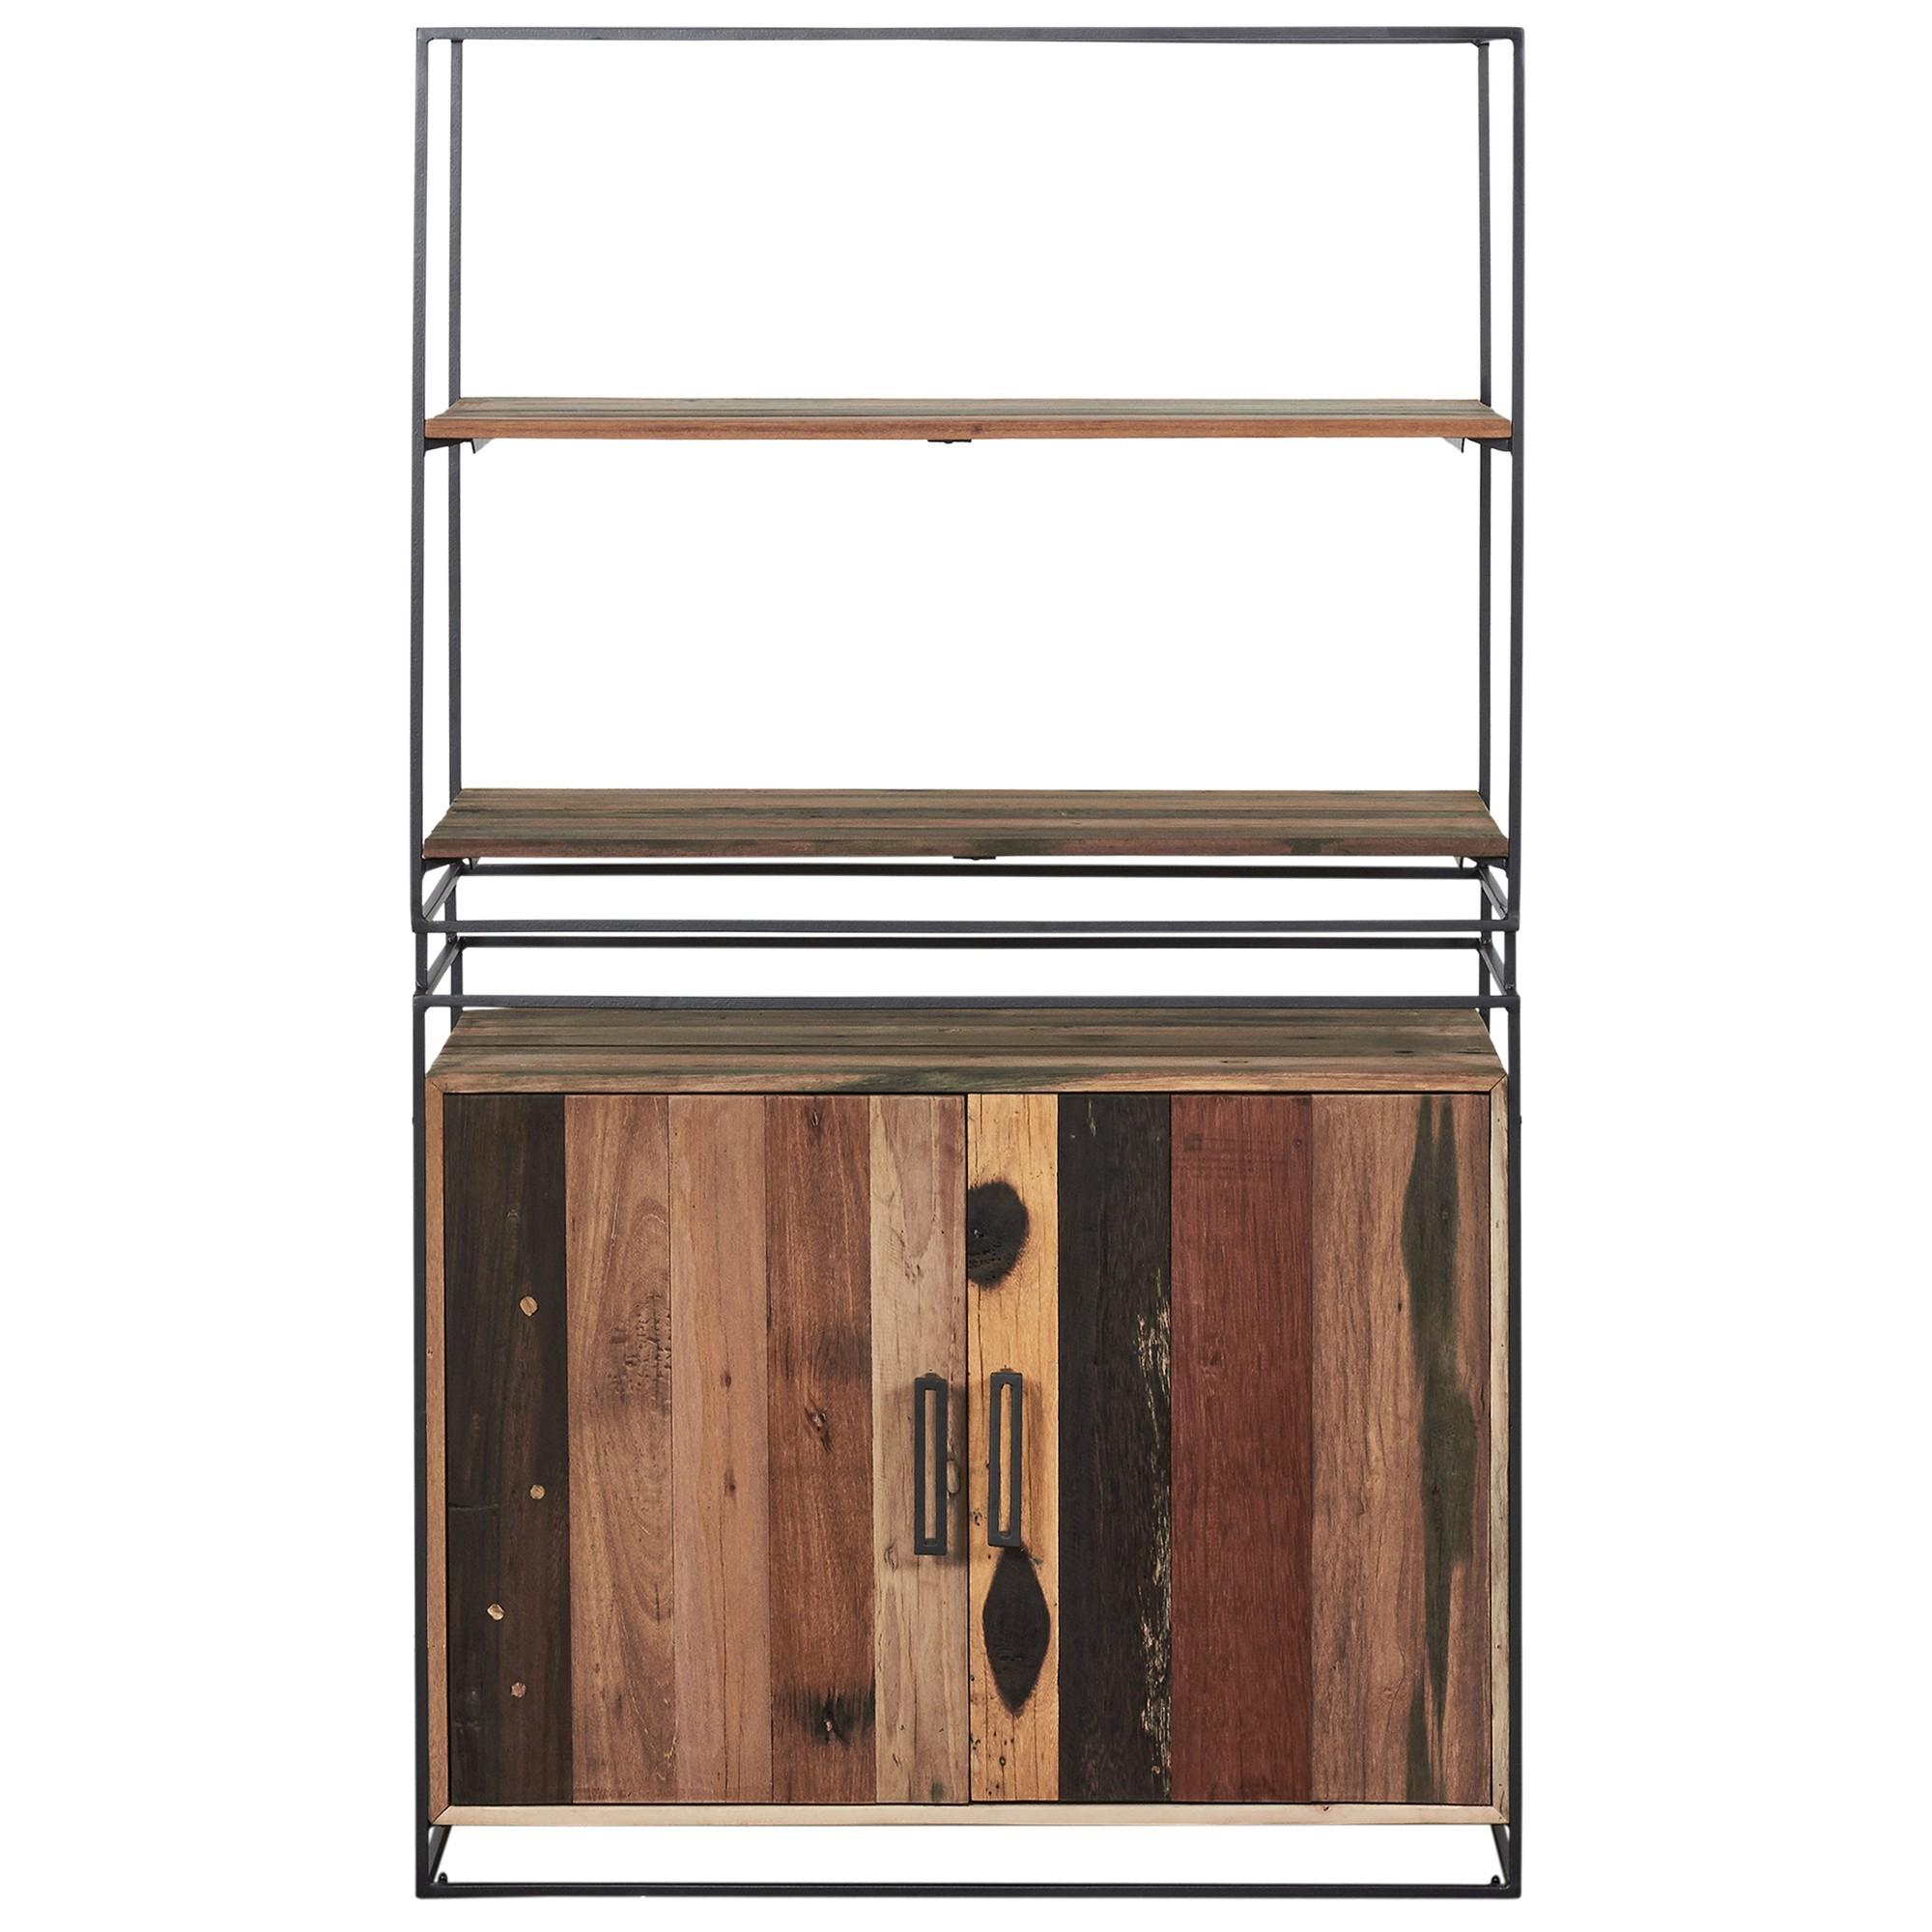 Nako Commercial Grade Reclaimed Timber & Iron 2 Door Side Cabinet with Shelf